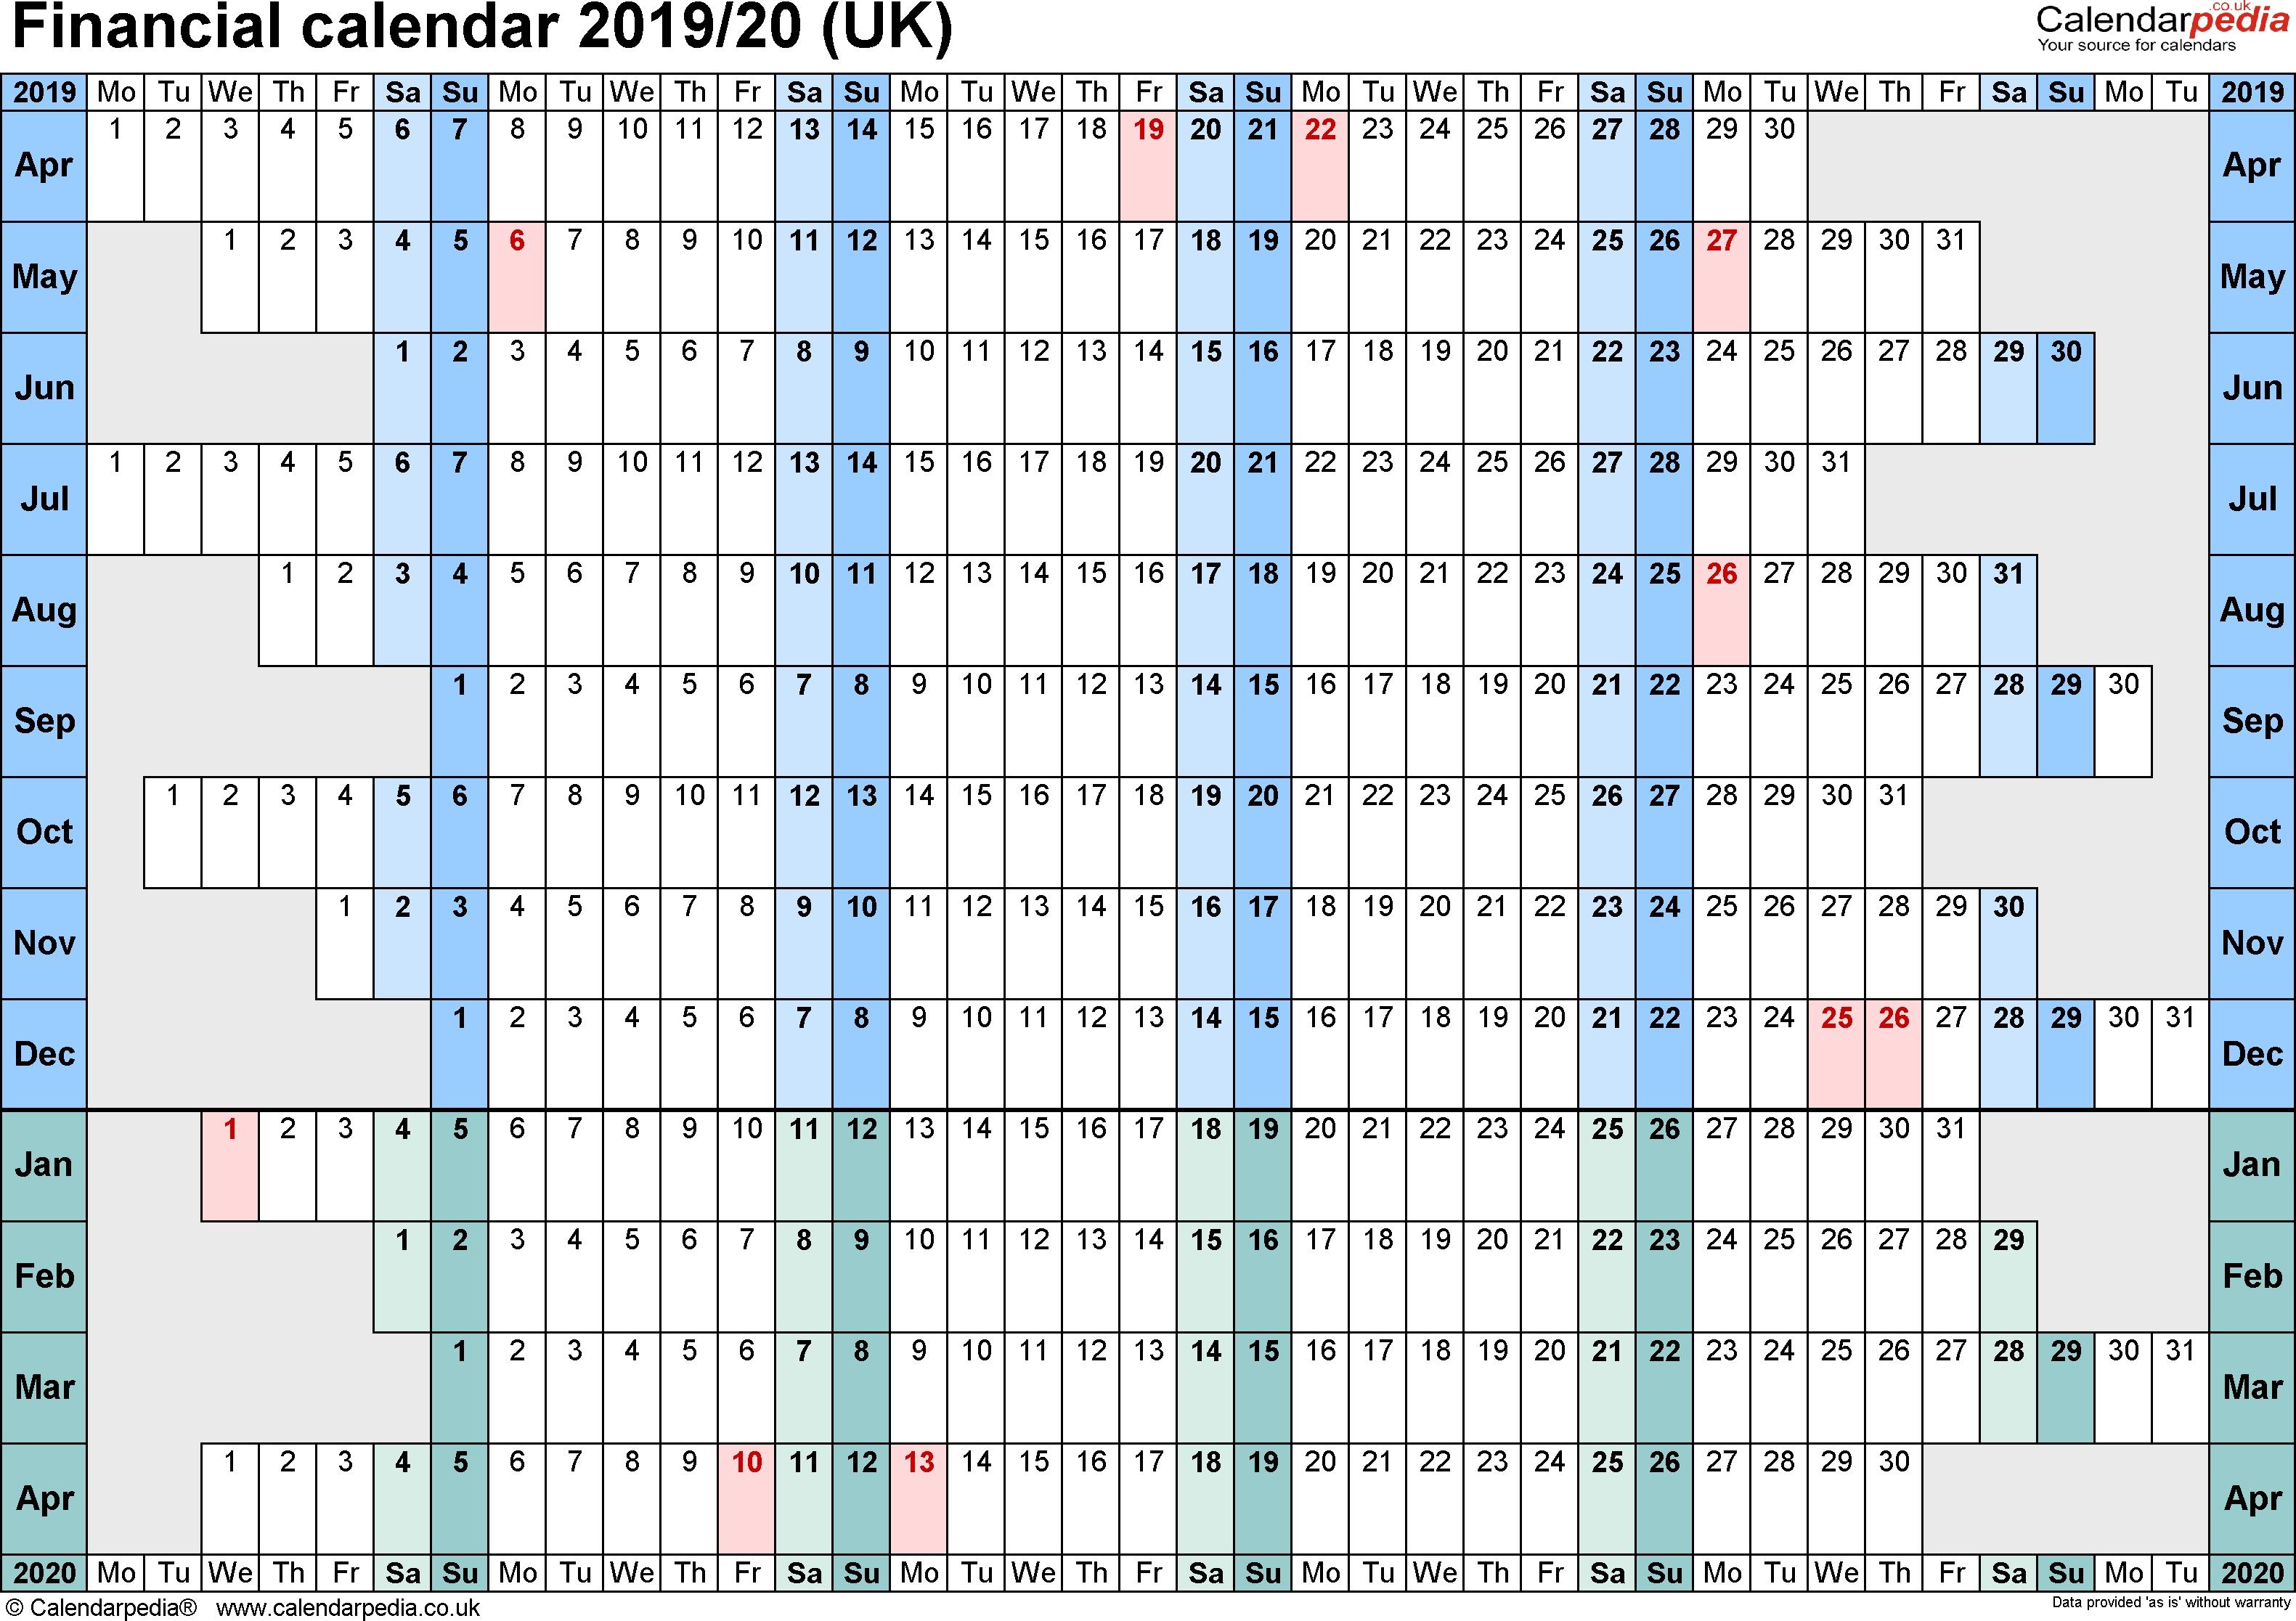 Financial Calendars 2019/20 (Uk) In Microsoft Excel Format in Tax Week Calendar 2019 2020